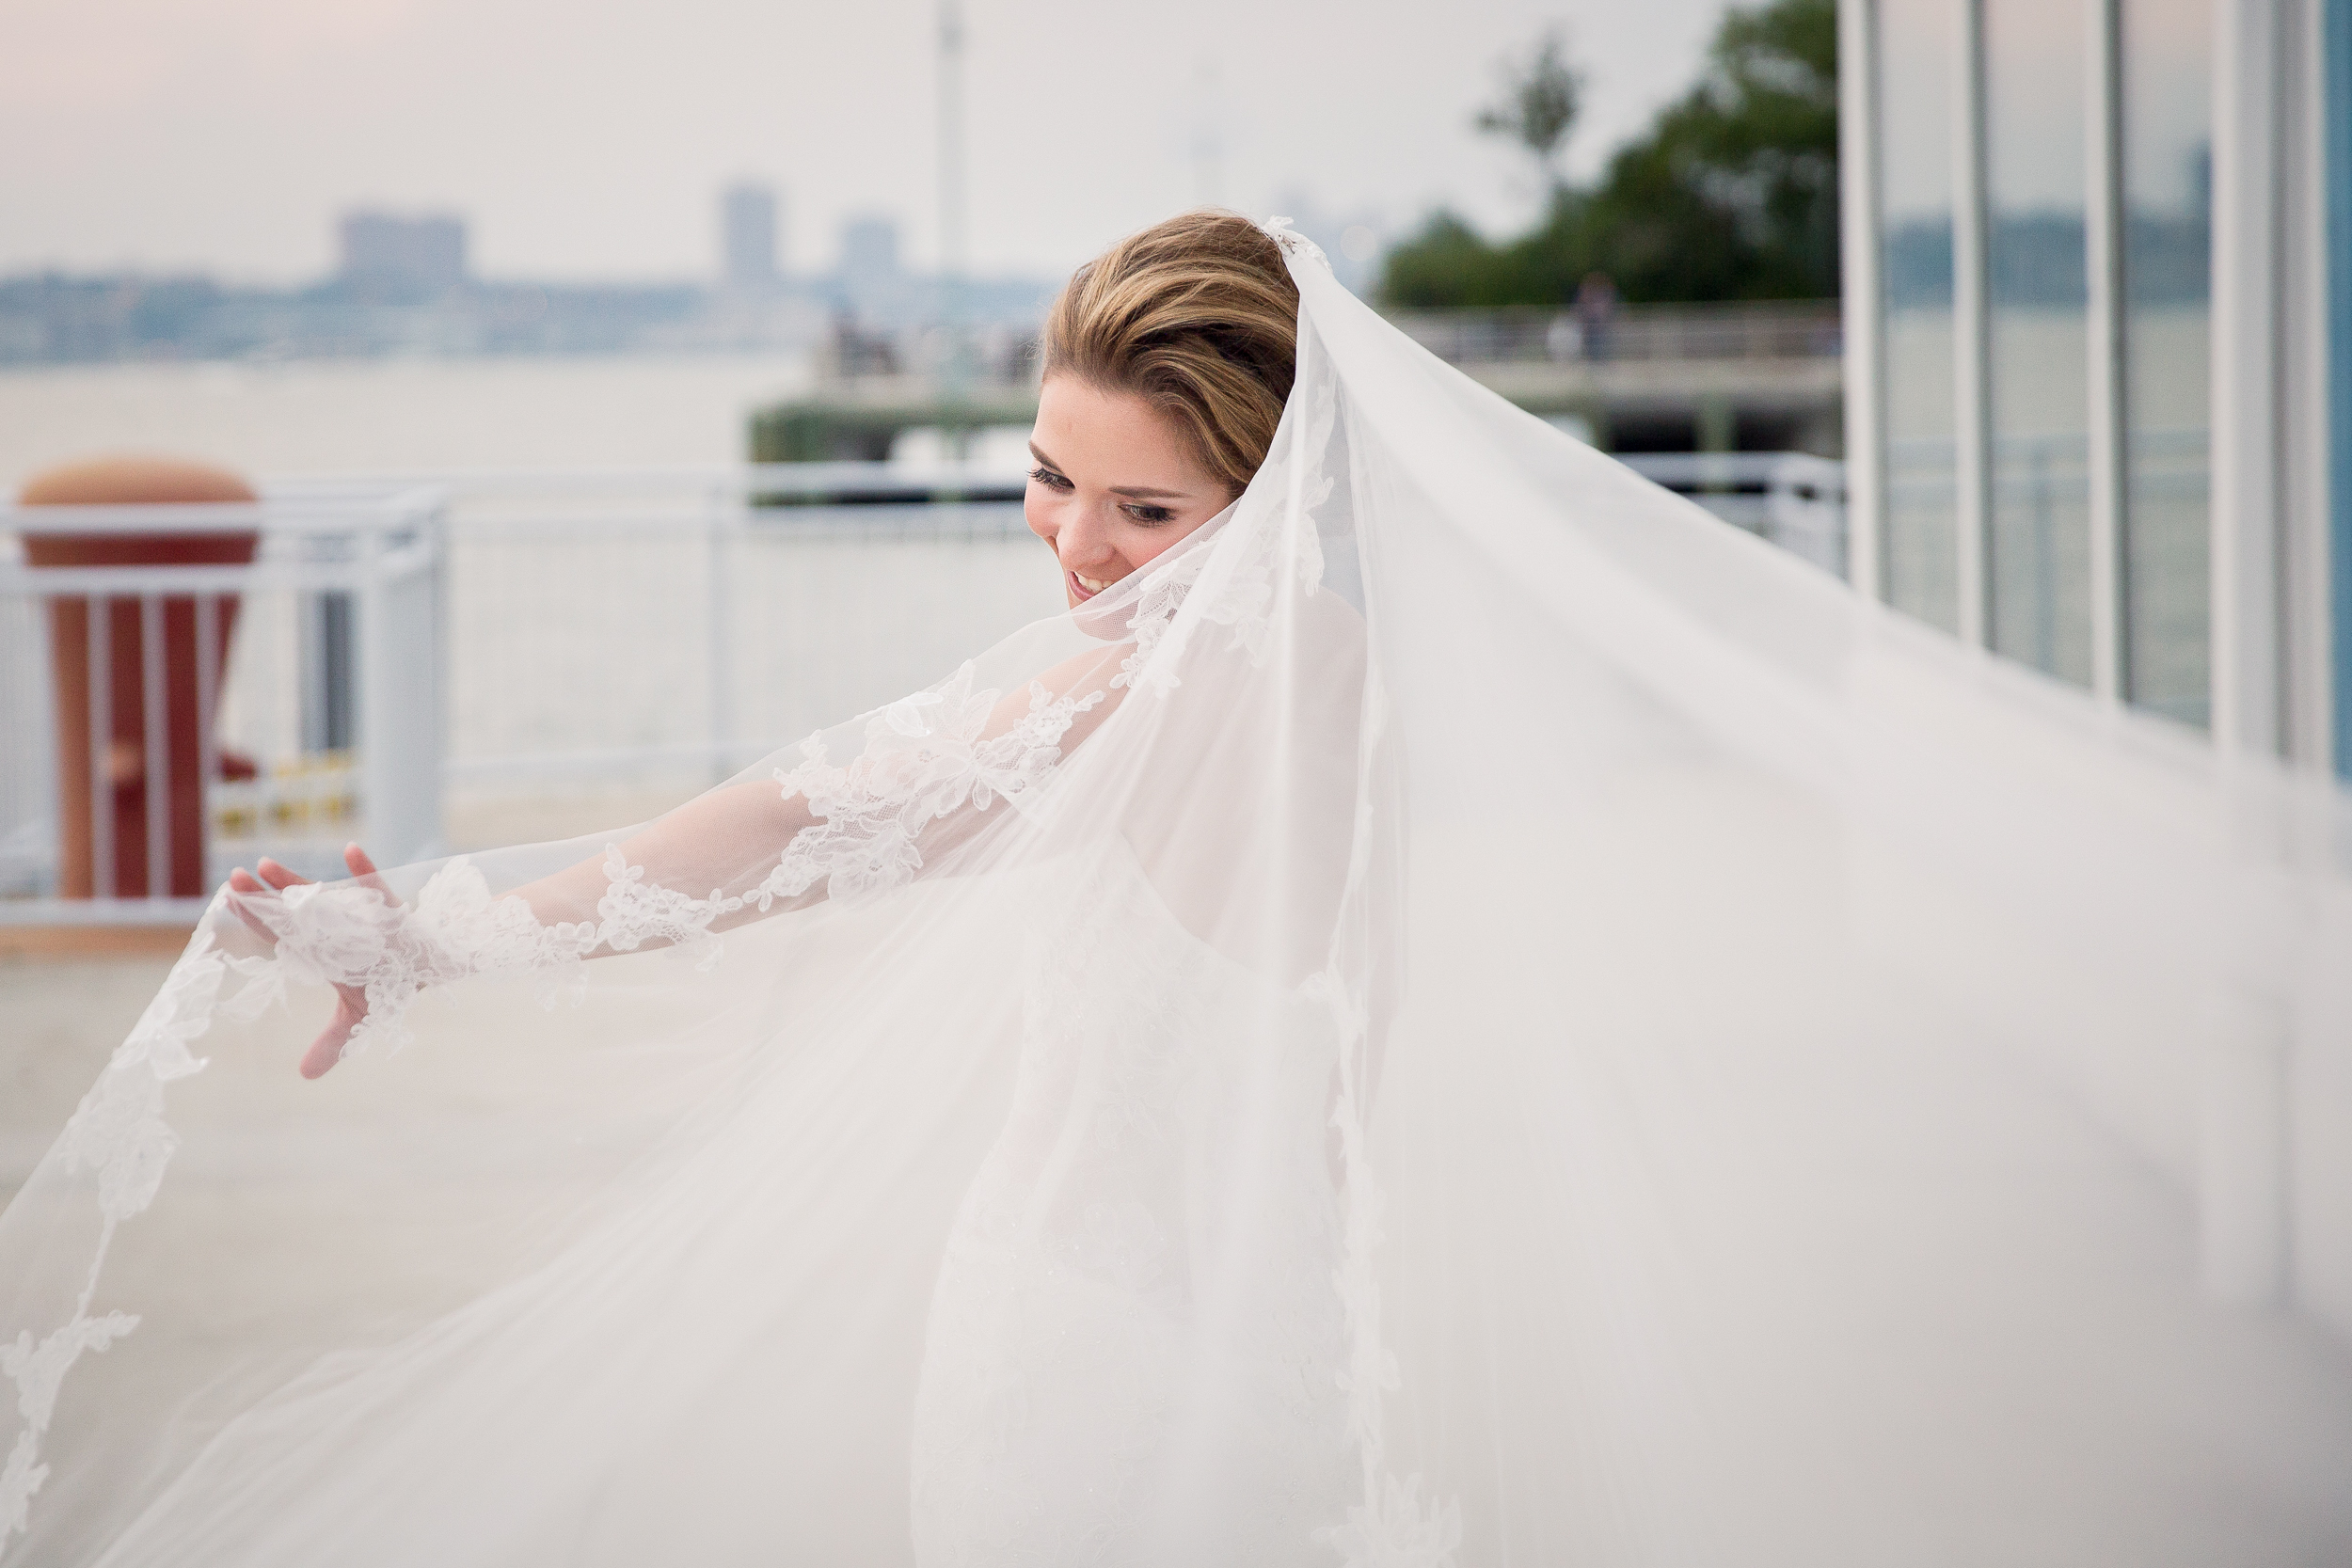 Ceci_New_York_Style_Luxury_Custom_Summer_Wedding_CeciBride_Letterpress_NewYork_Foil_Lighthouse_Chelsea_Piers_55.jpg